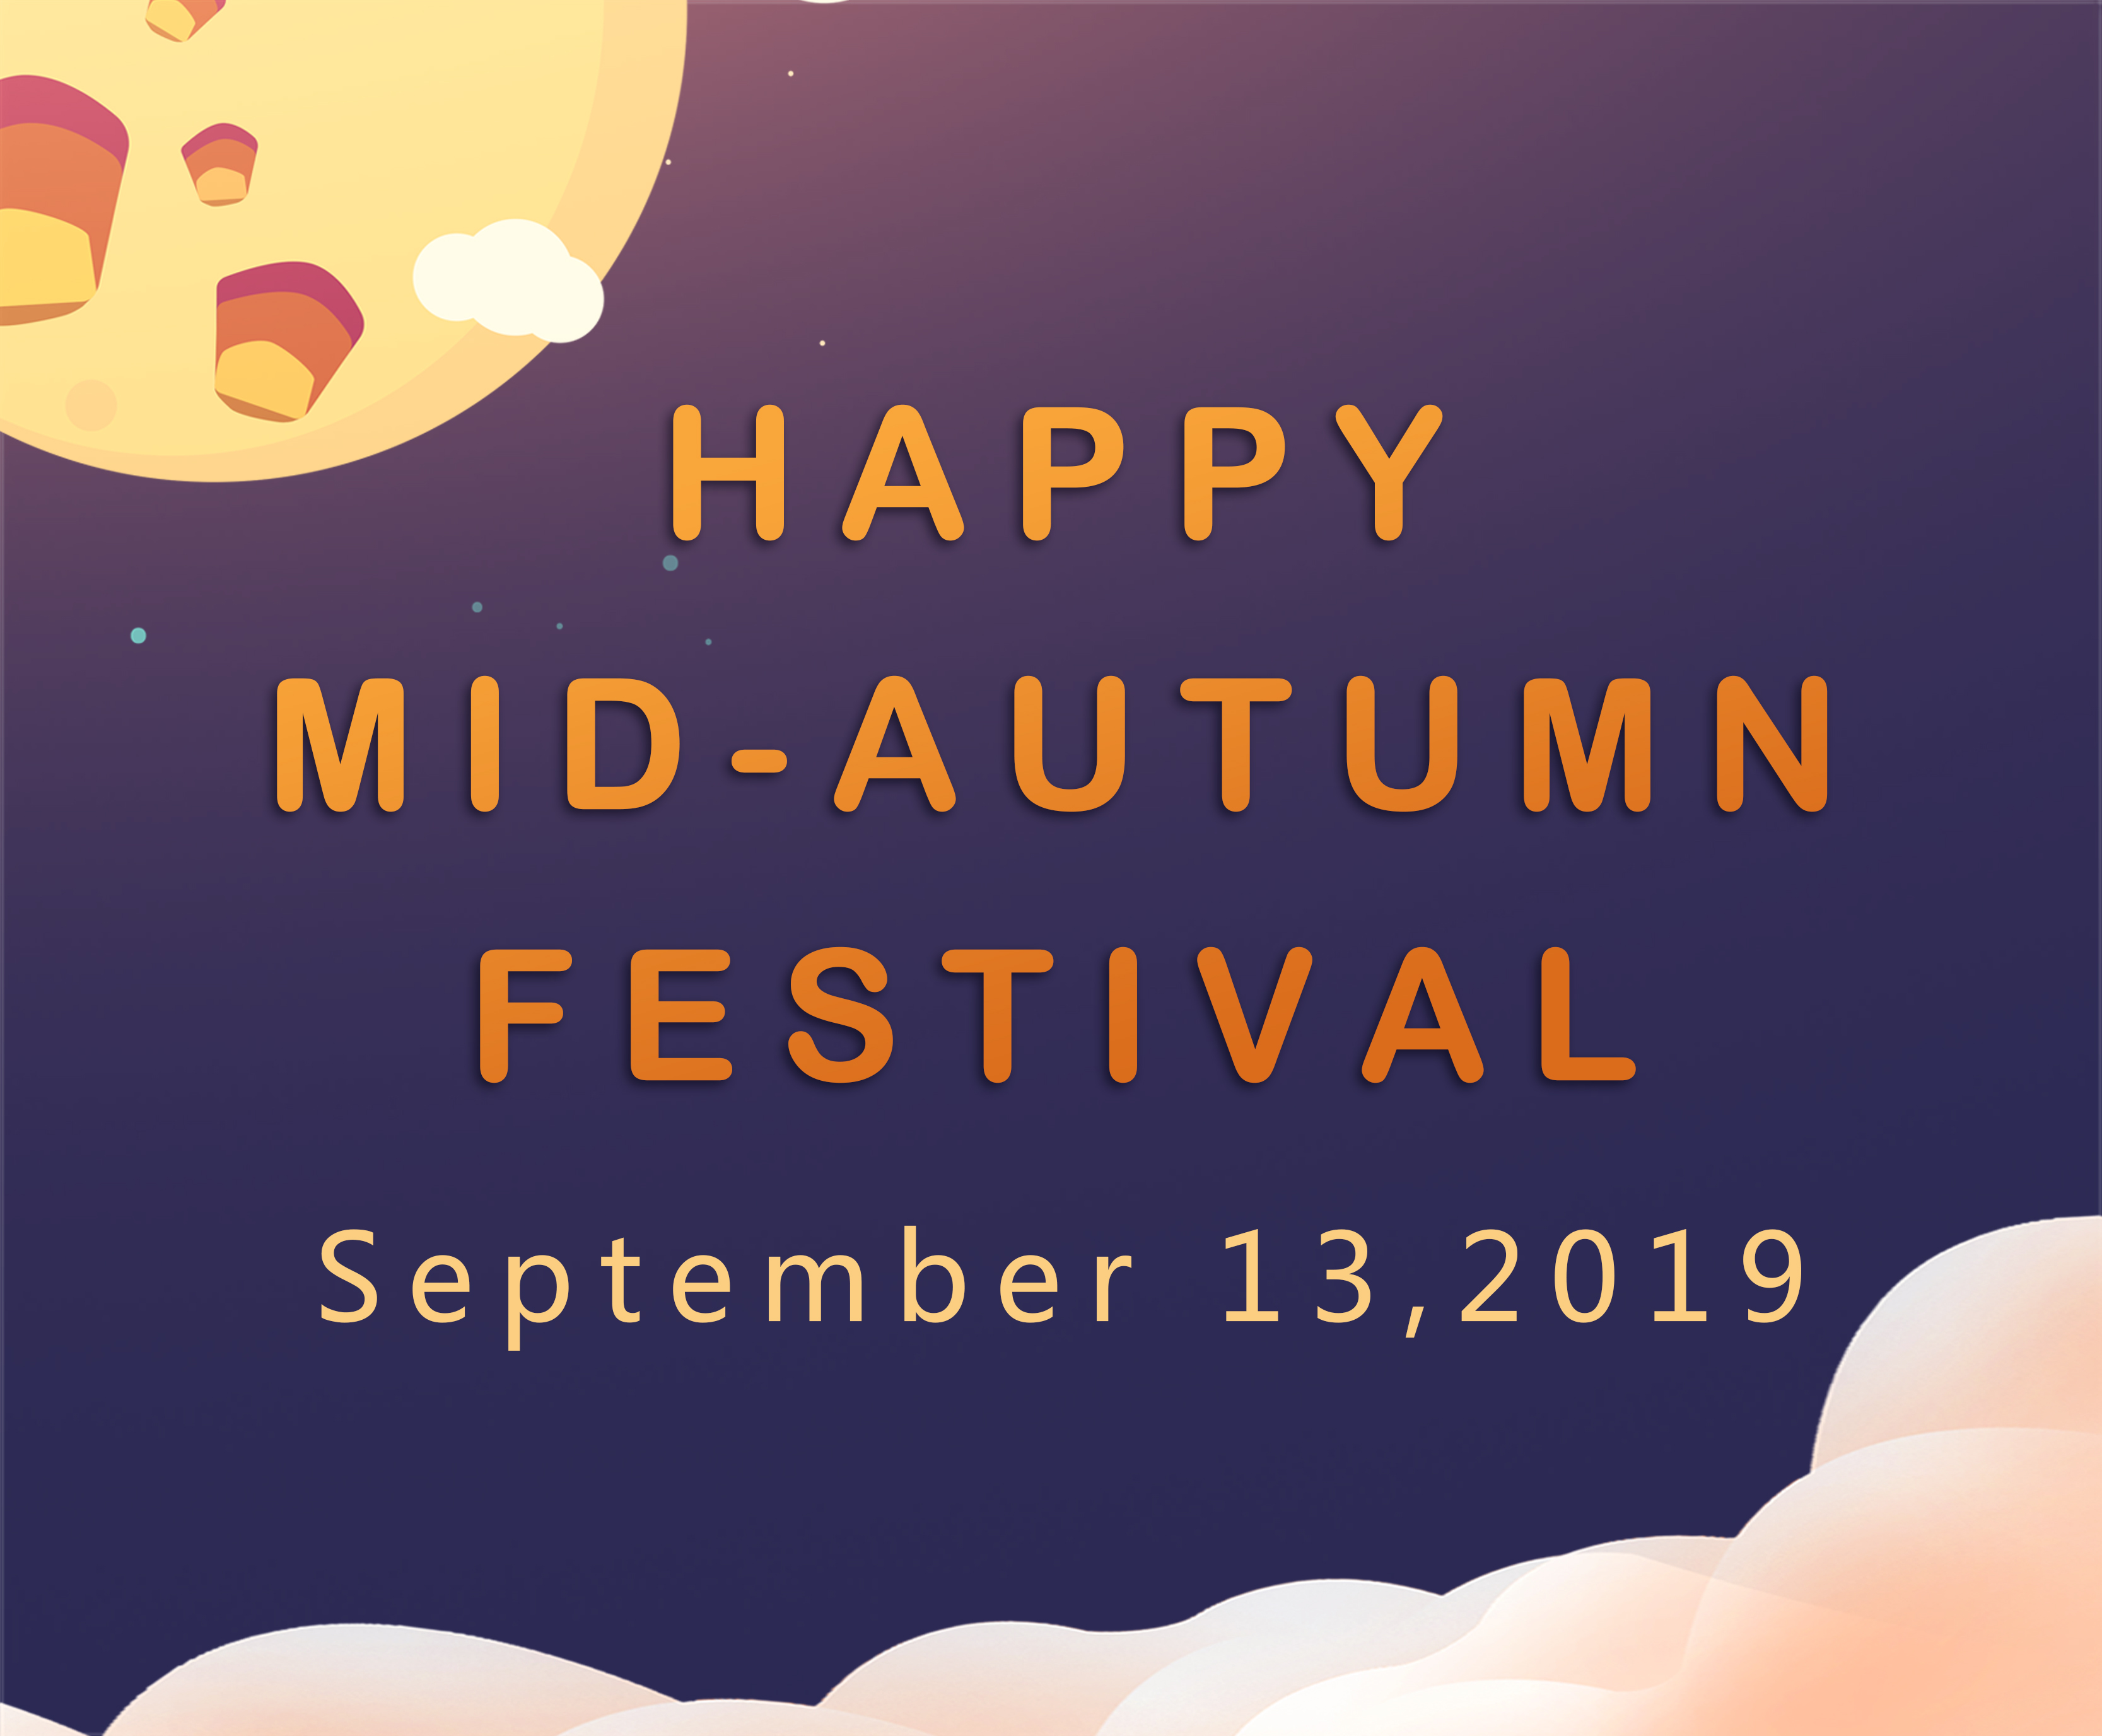 Happy Mid-Autumn Festival 2019 FOODCHEM™